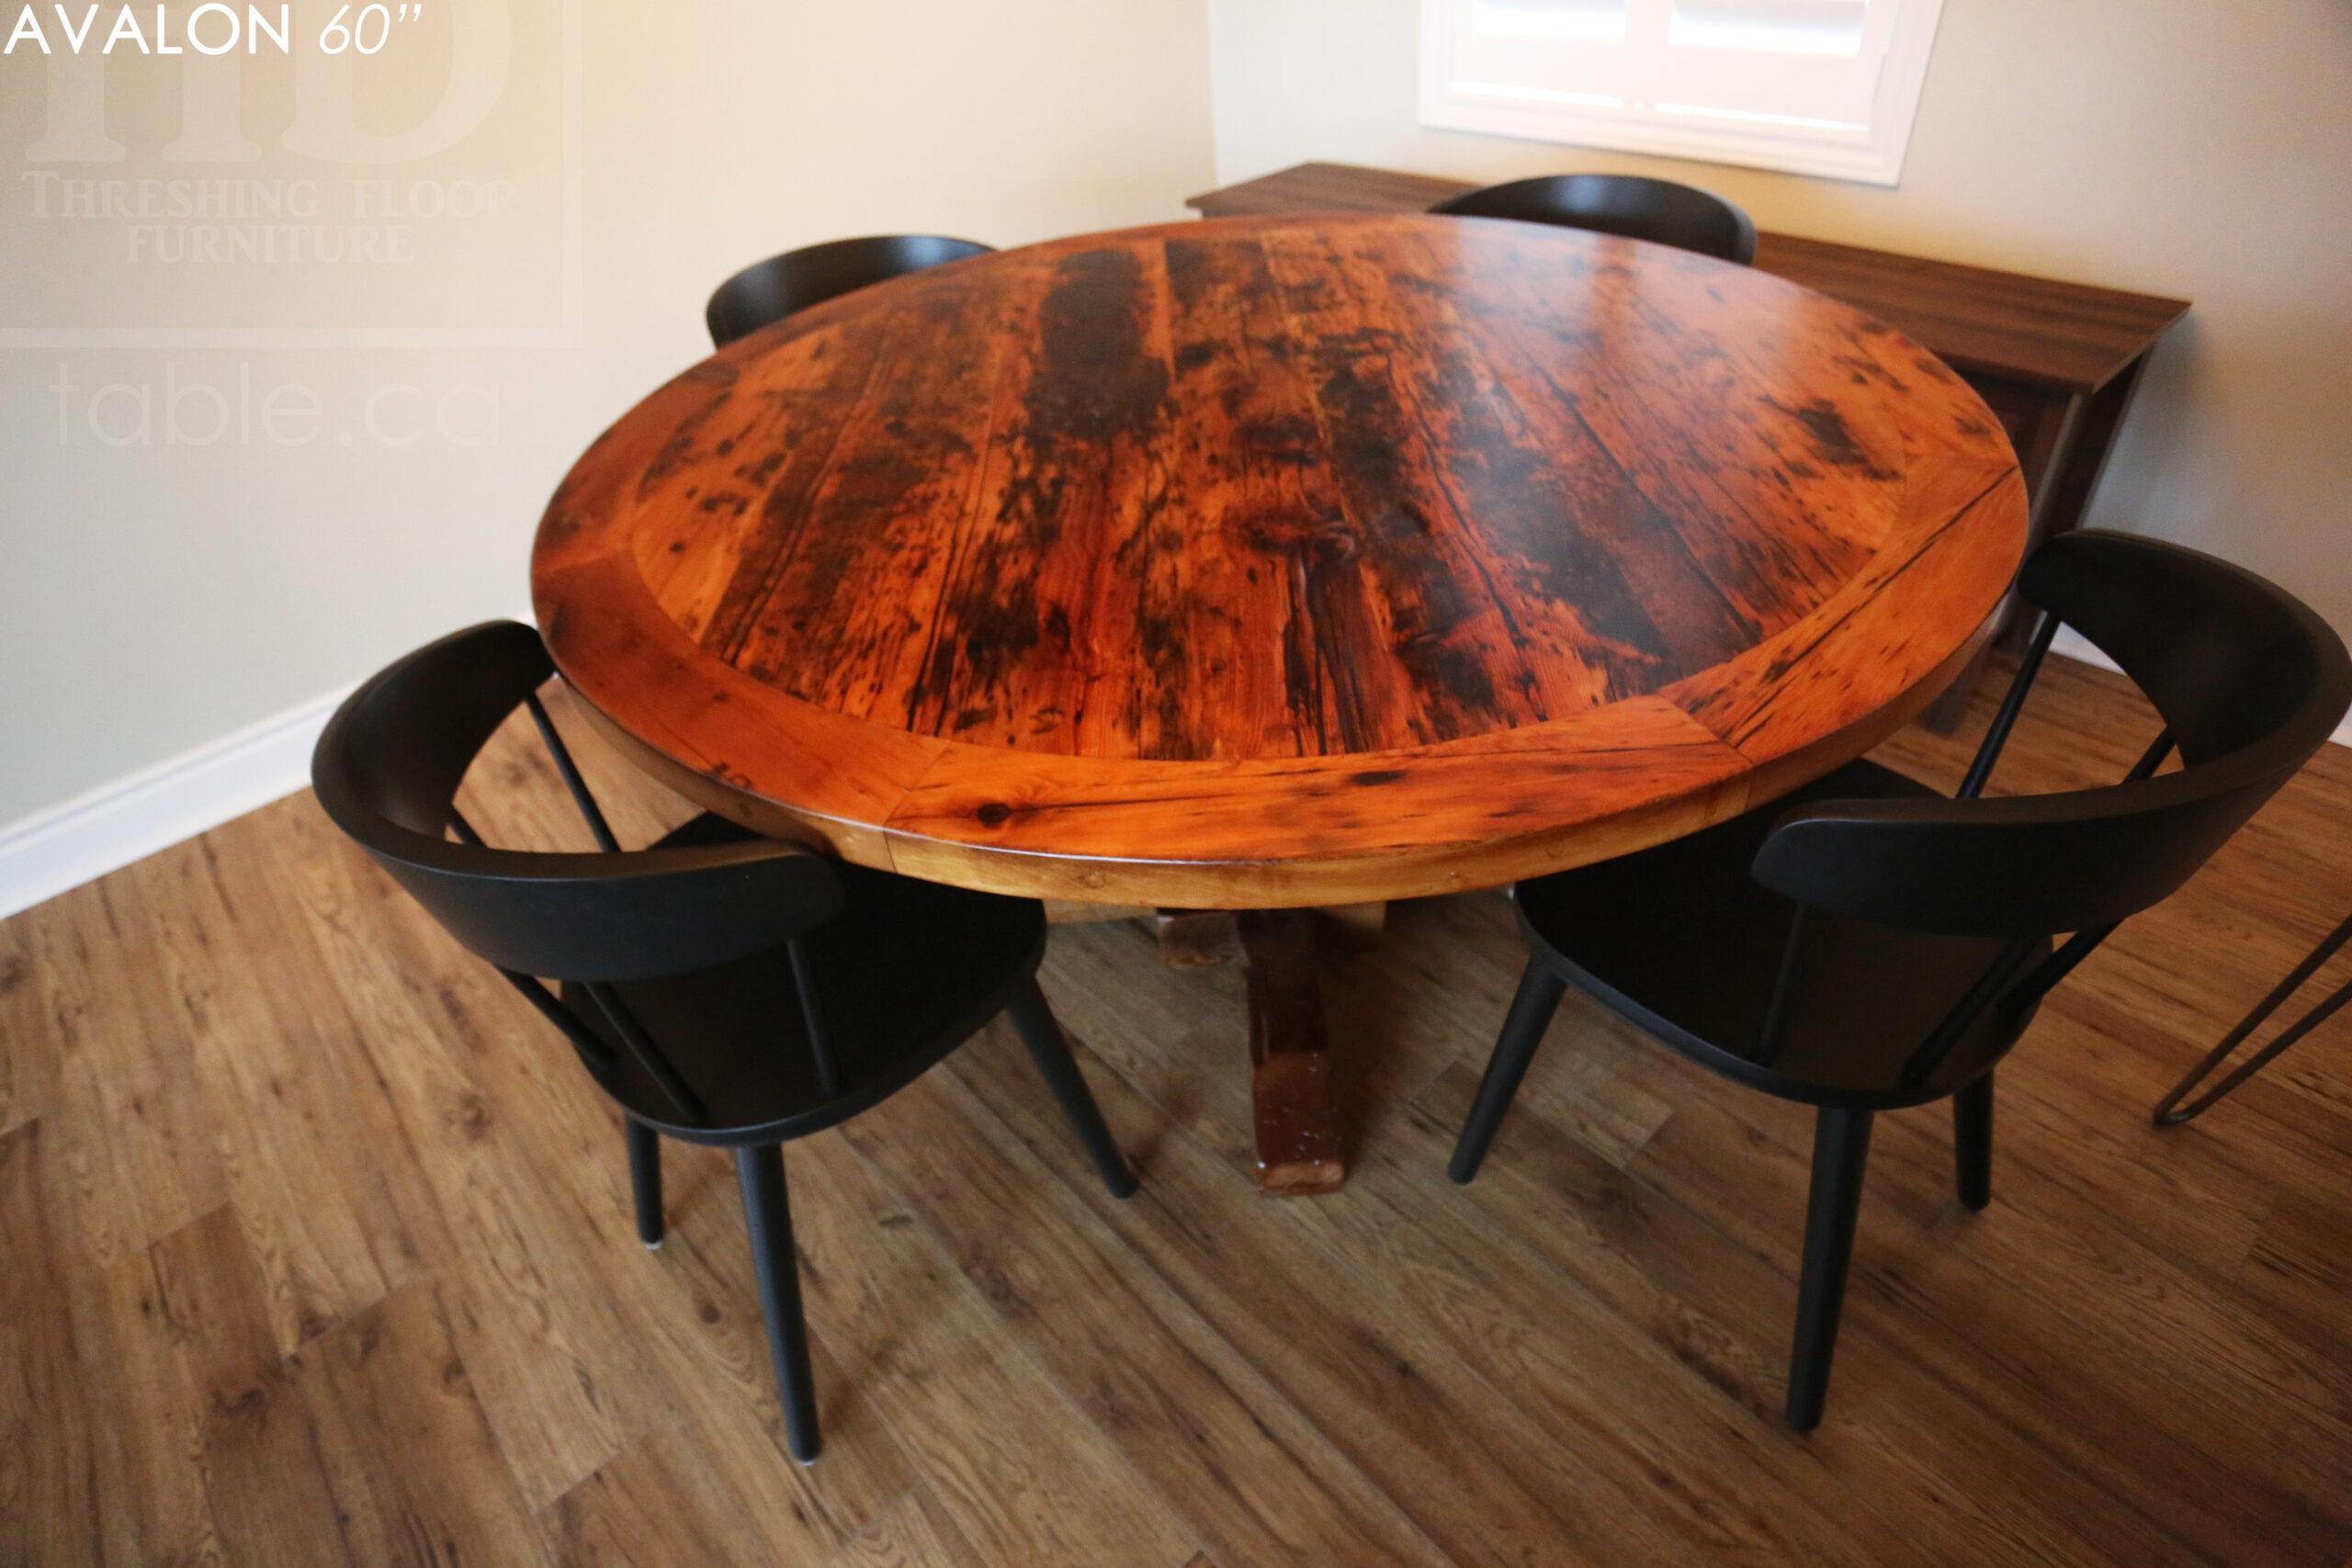 "60"" Round Reclaimed Wood Table - Hand-Hewn Beam Base - Hemlock Threshing Floor 2"" Top - Original edges & distressing maintained - Premium epoxy clearcoat [medium thickness] + satin polyurethane finish - www.table.ca"